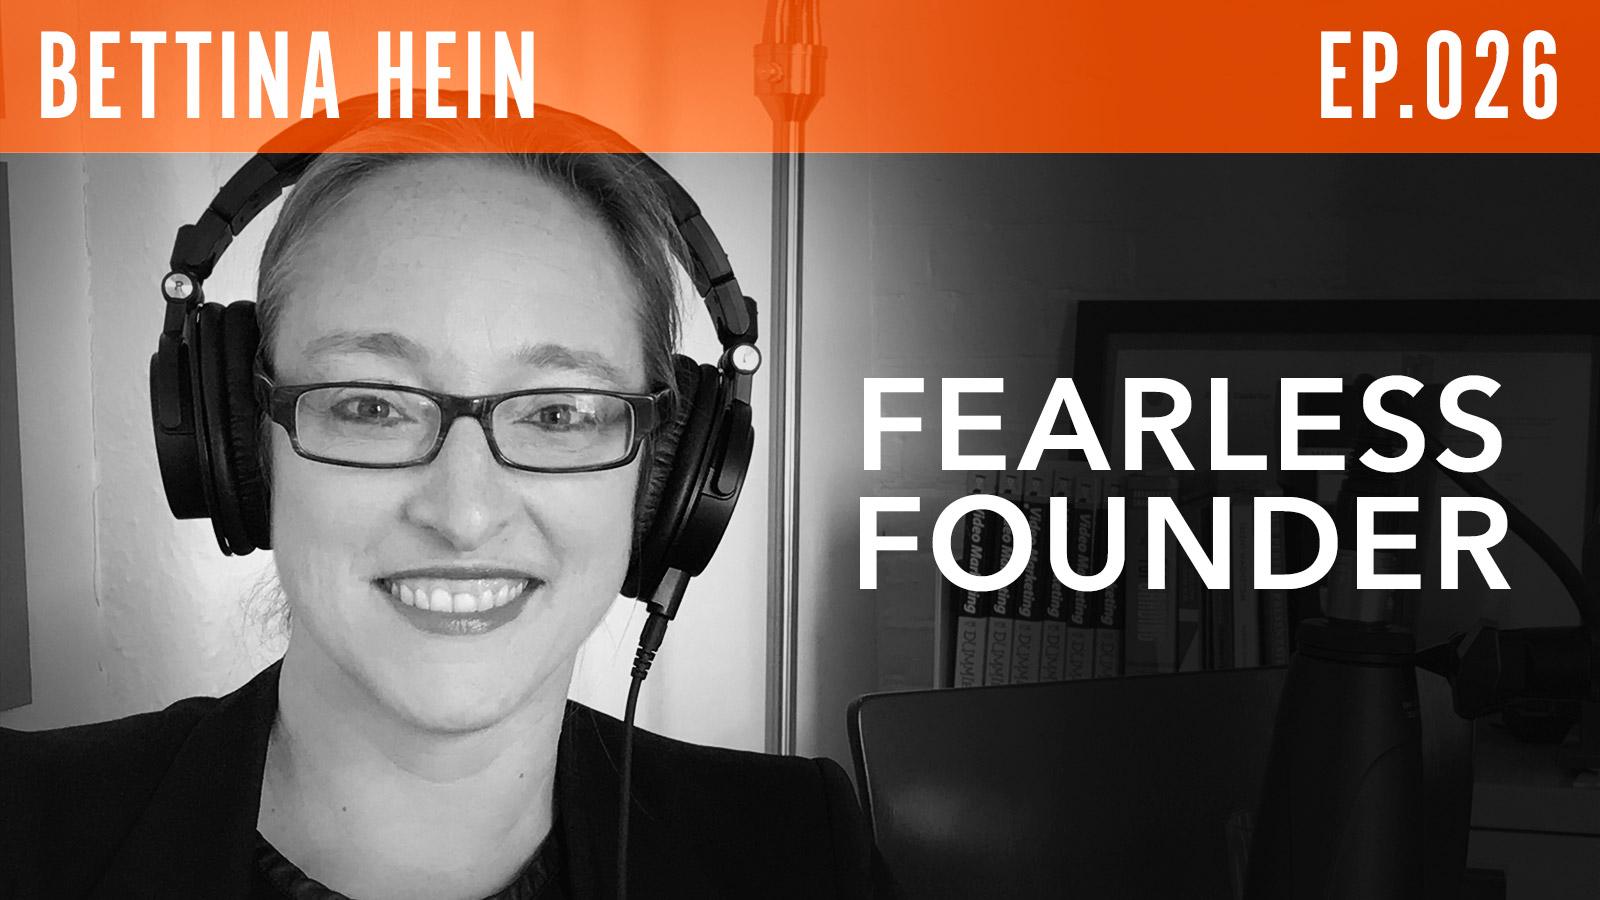 Bettina Hein  Fearless Founder